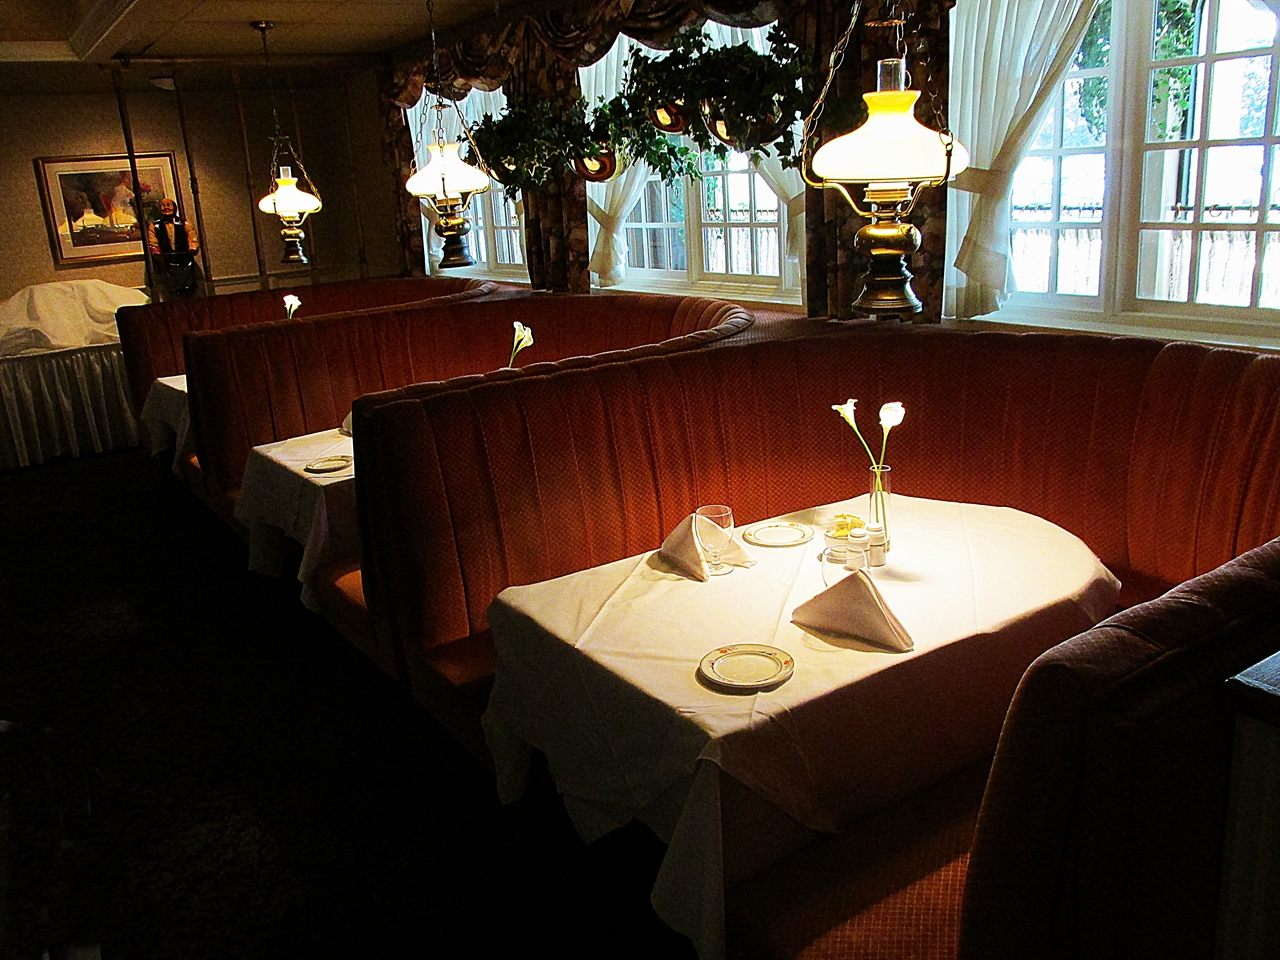 Regency dining room 1315 r gent street fredericton for Regency dining room